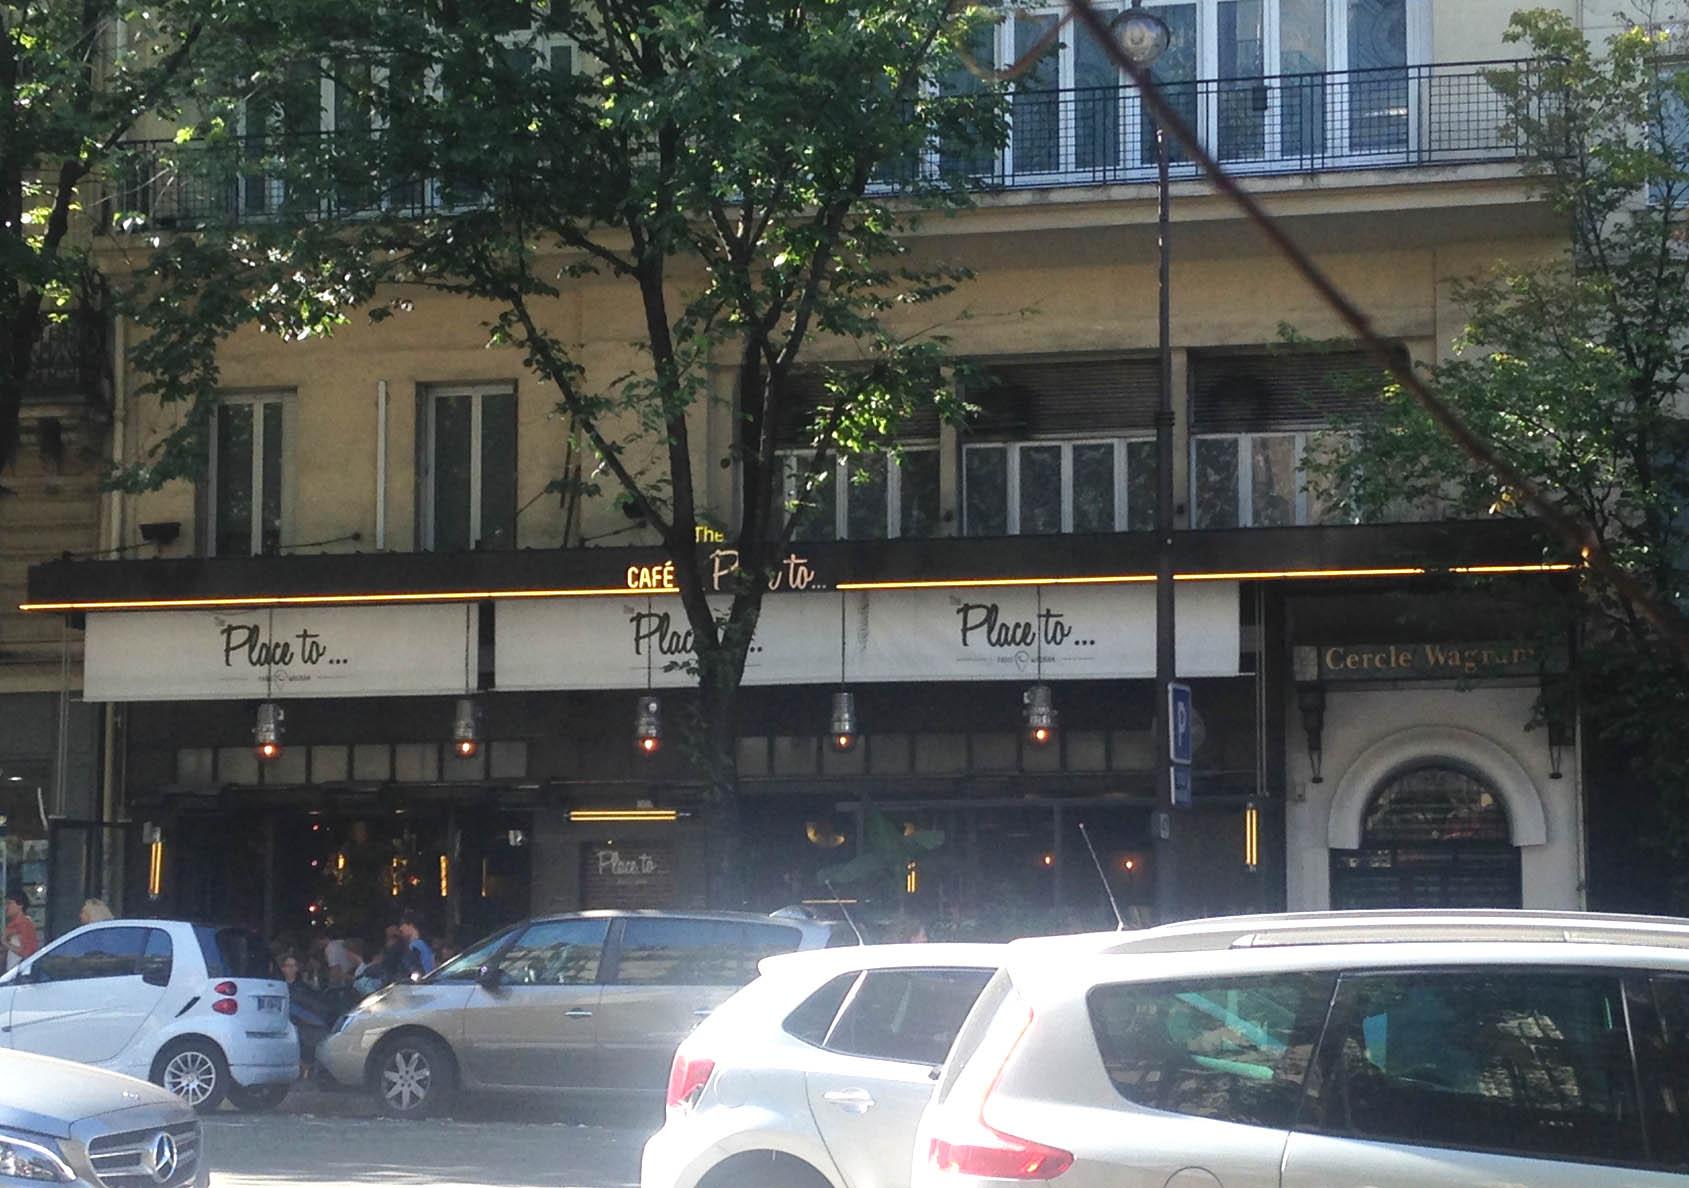 The Place To Paris